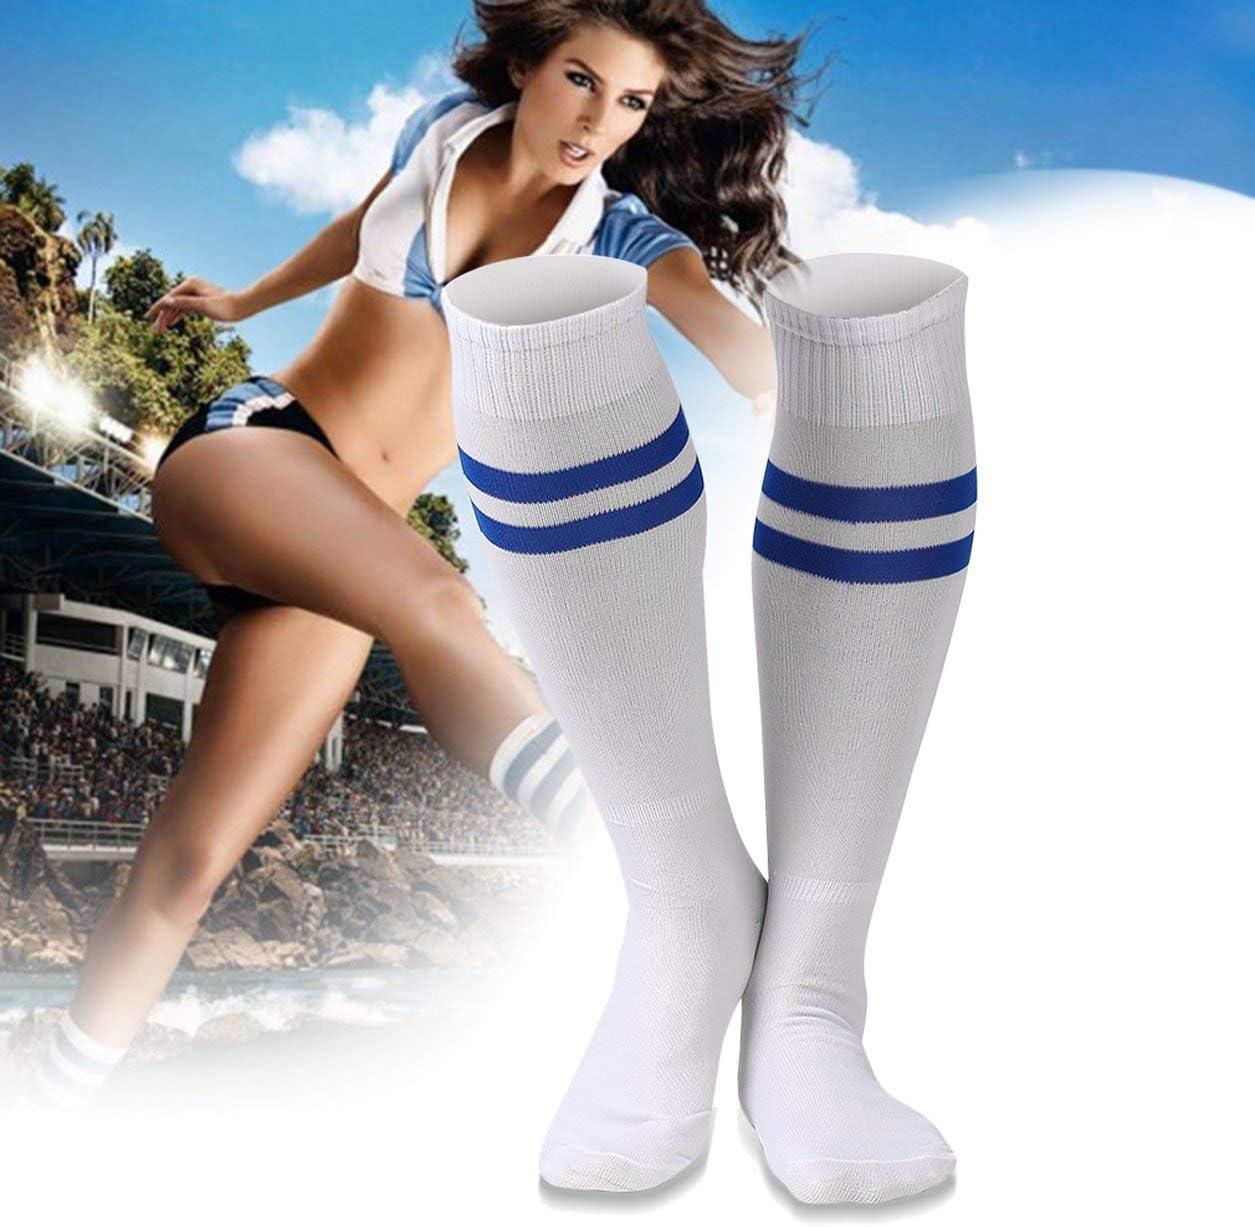 Dailyinshop 1 par de Deportes Calcetines hasta la Rodilla Medias Legging F/útbol F/útbol B/éisbol sobre la Rodilla Tobillo Hombres Mujeres Calcetines